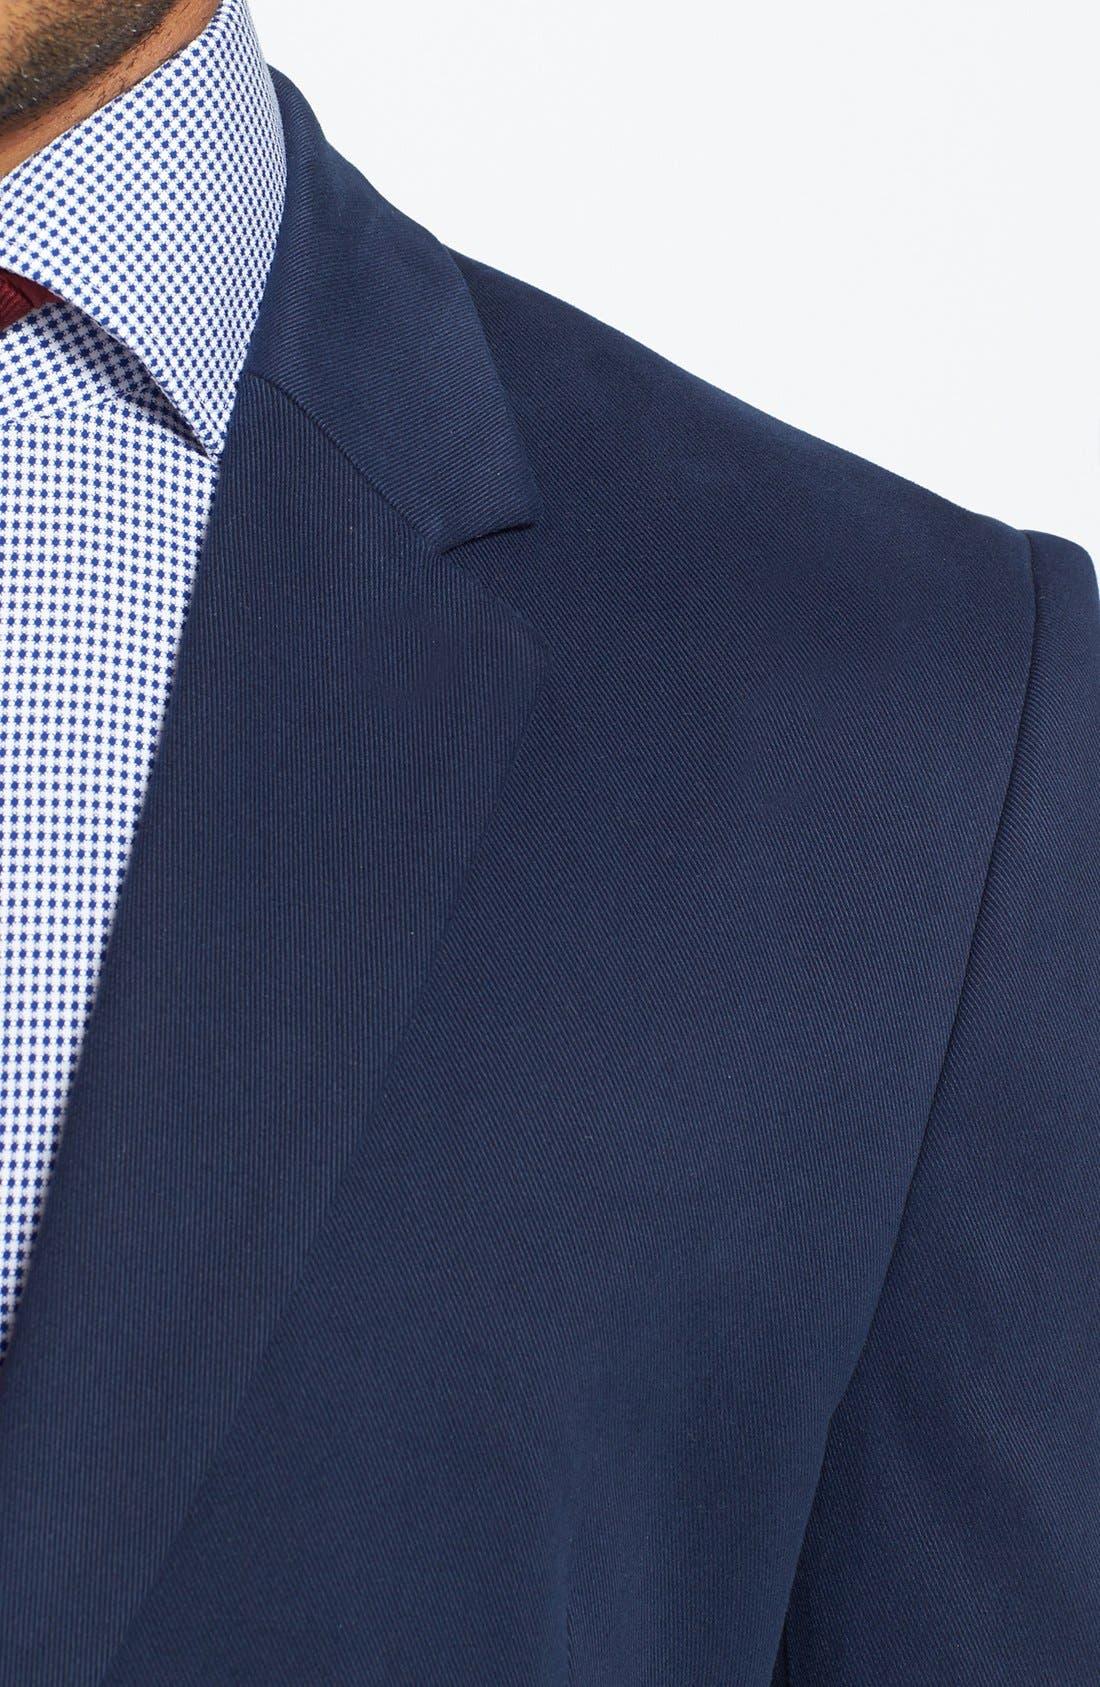 Alternate Image 3  - HUGO 'Alston' Sportcoat